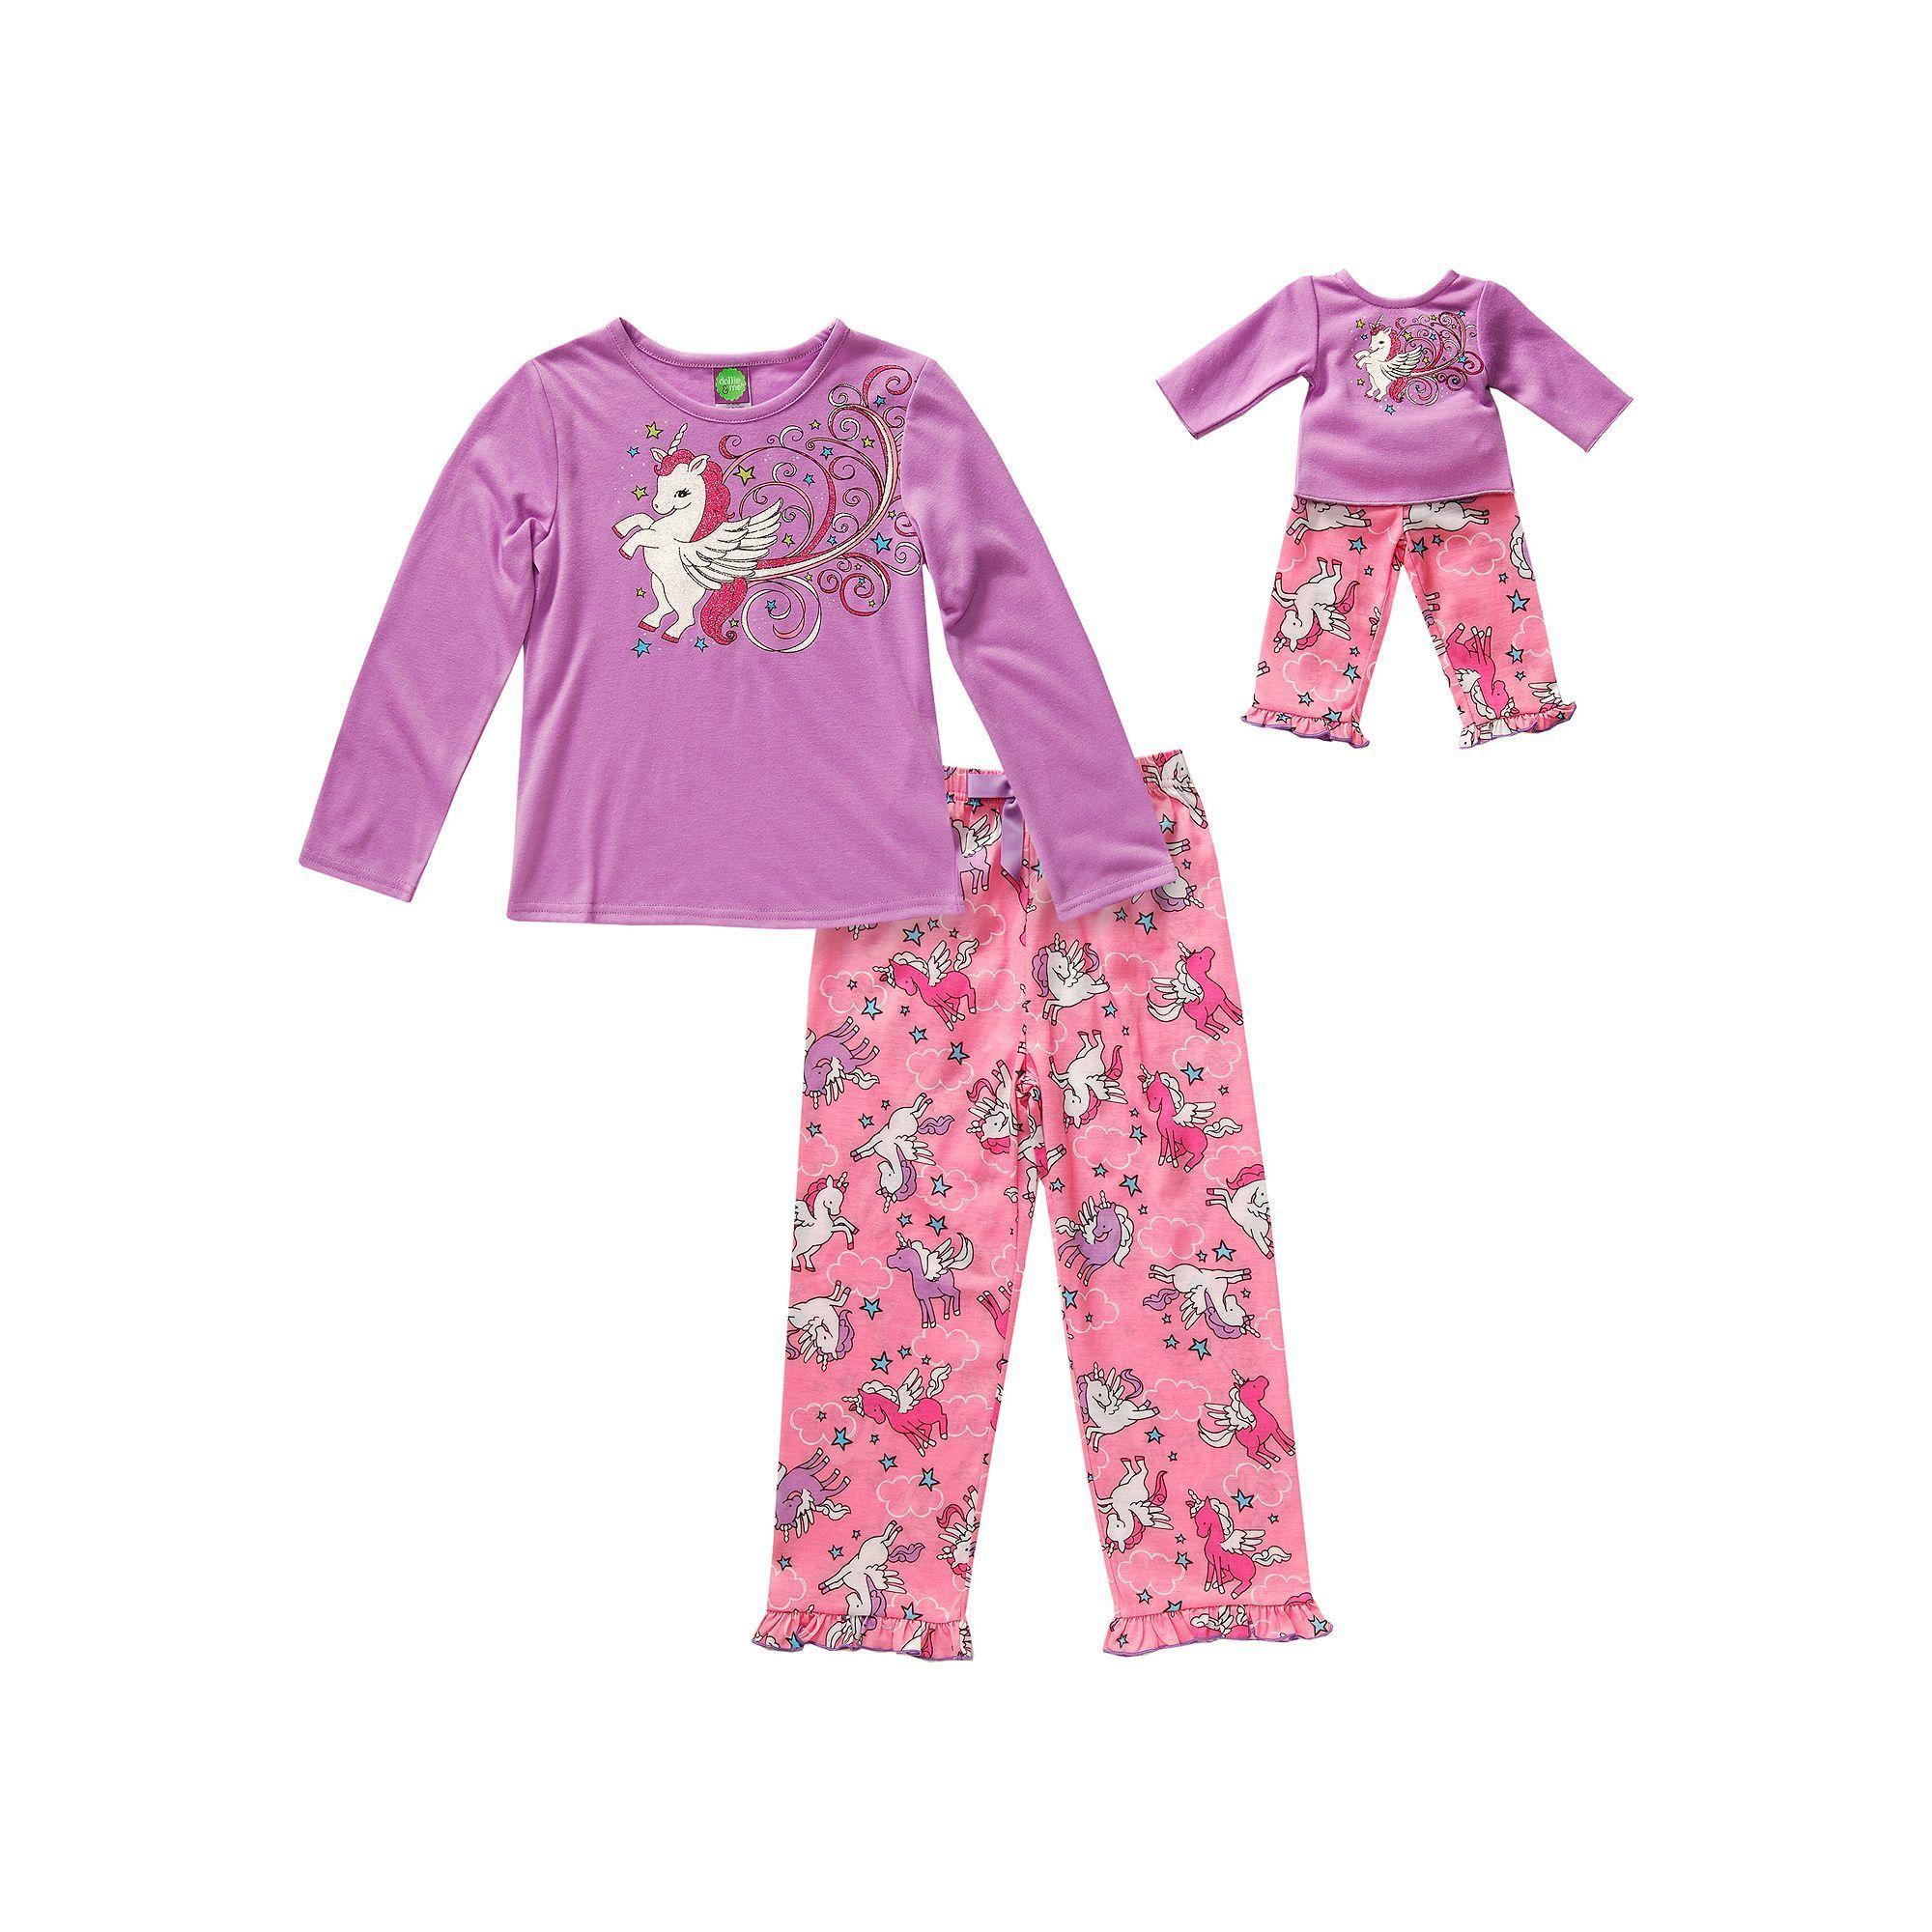 Girls 4-14 Dollie   Me Sparkly Unicorn Pajama Set  b64218676